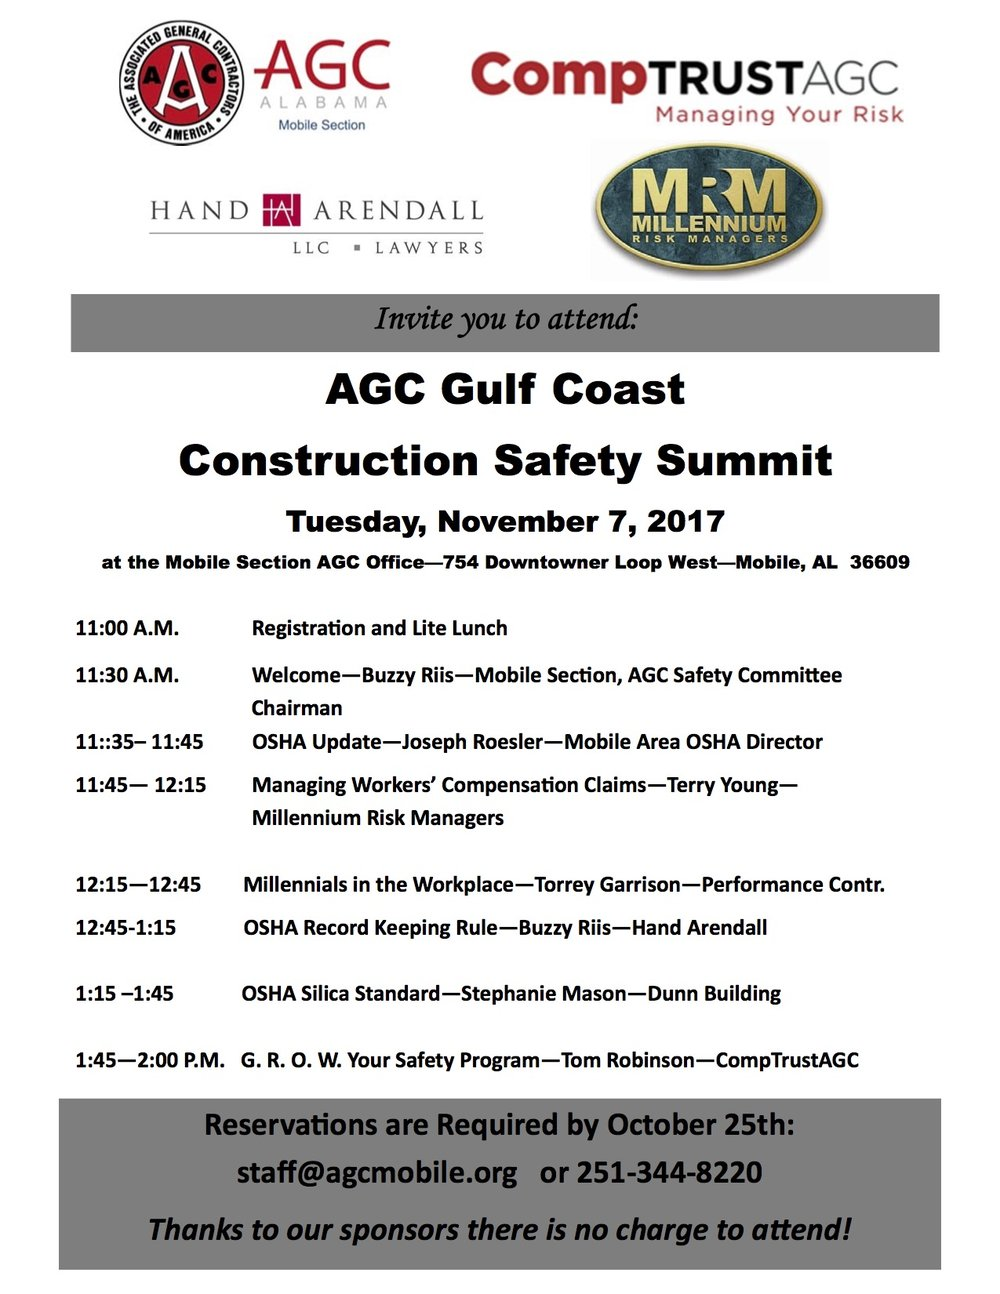 AGC Gulf Coast Construction Safety Summit Flyer.jpg